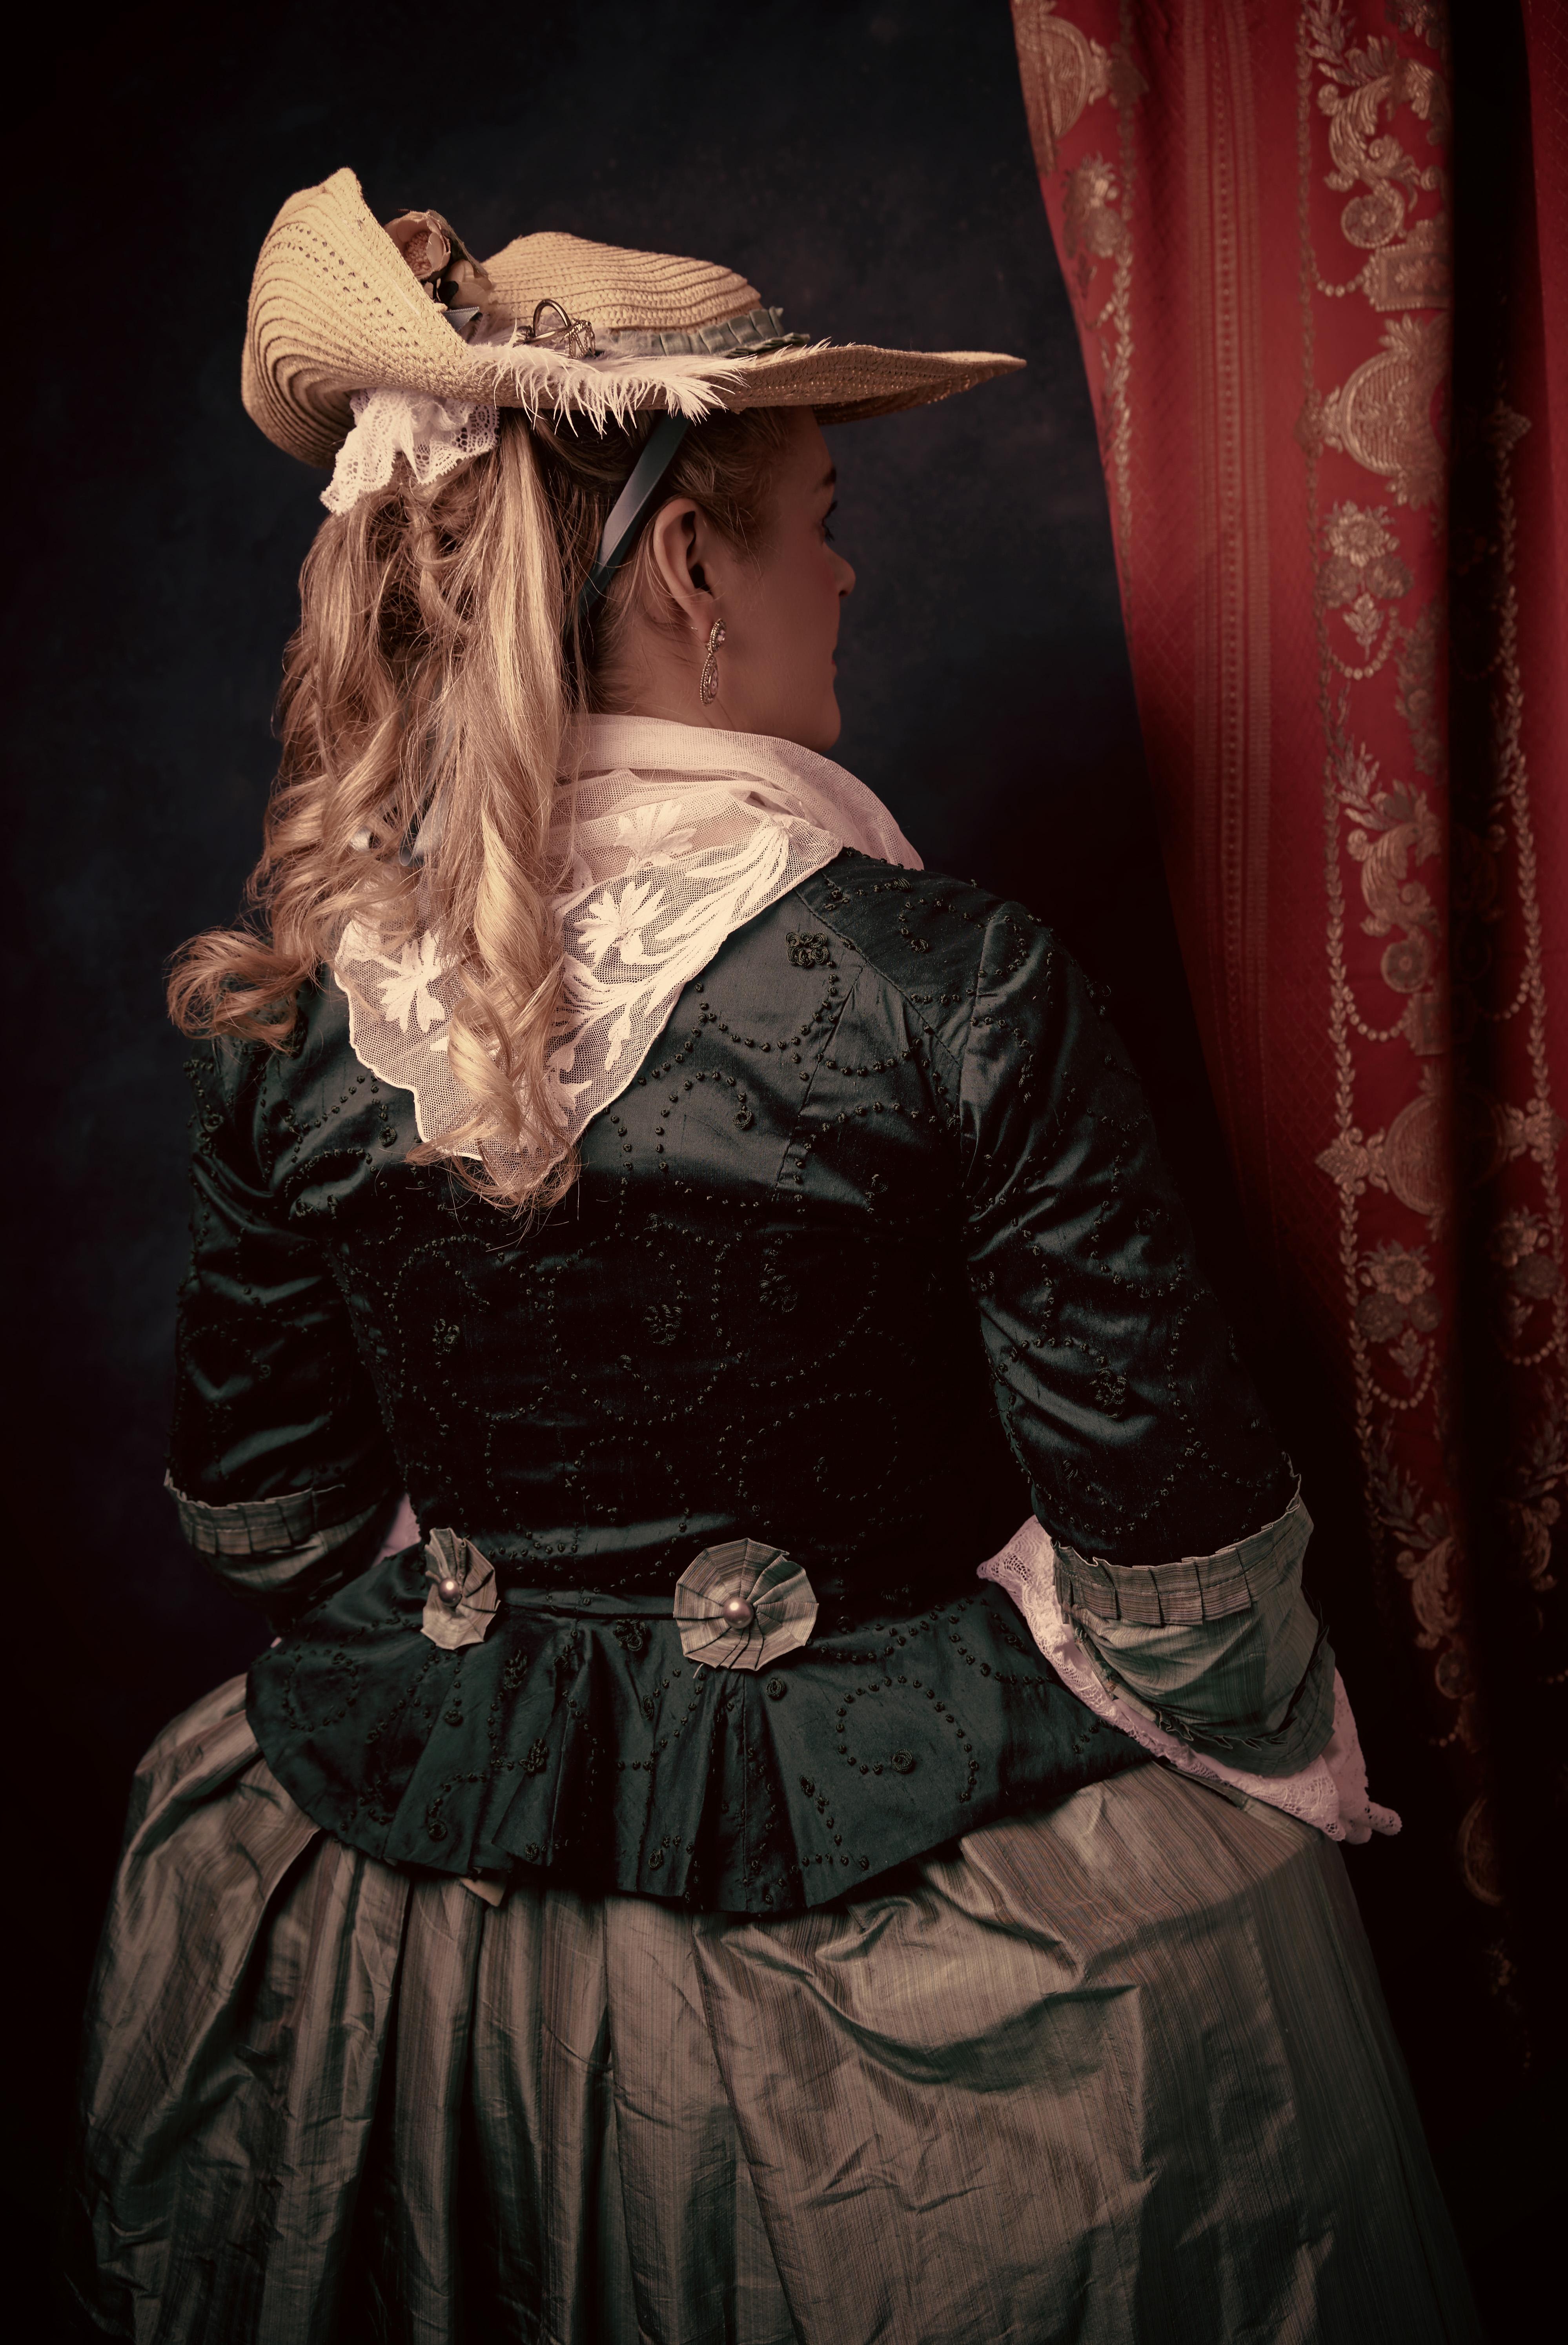 Jacke und Petticoat